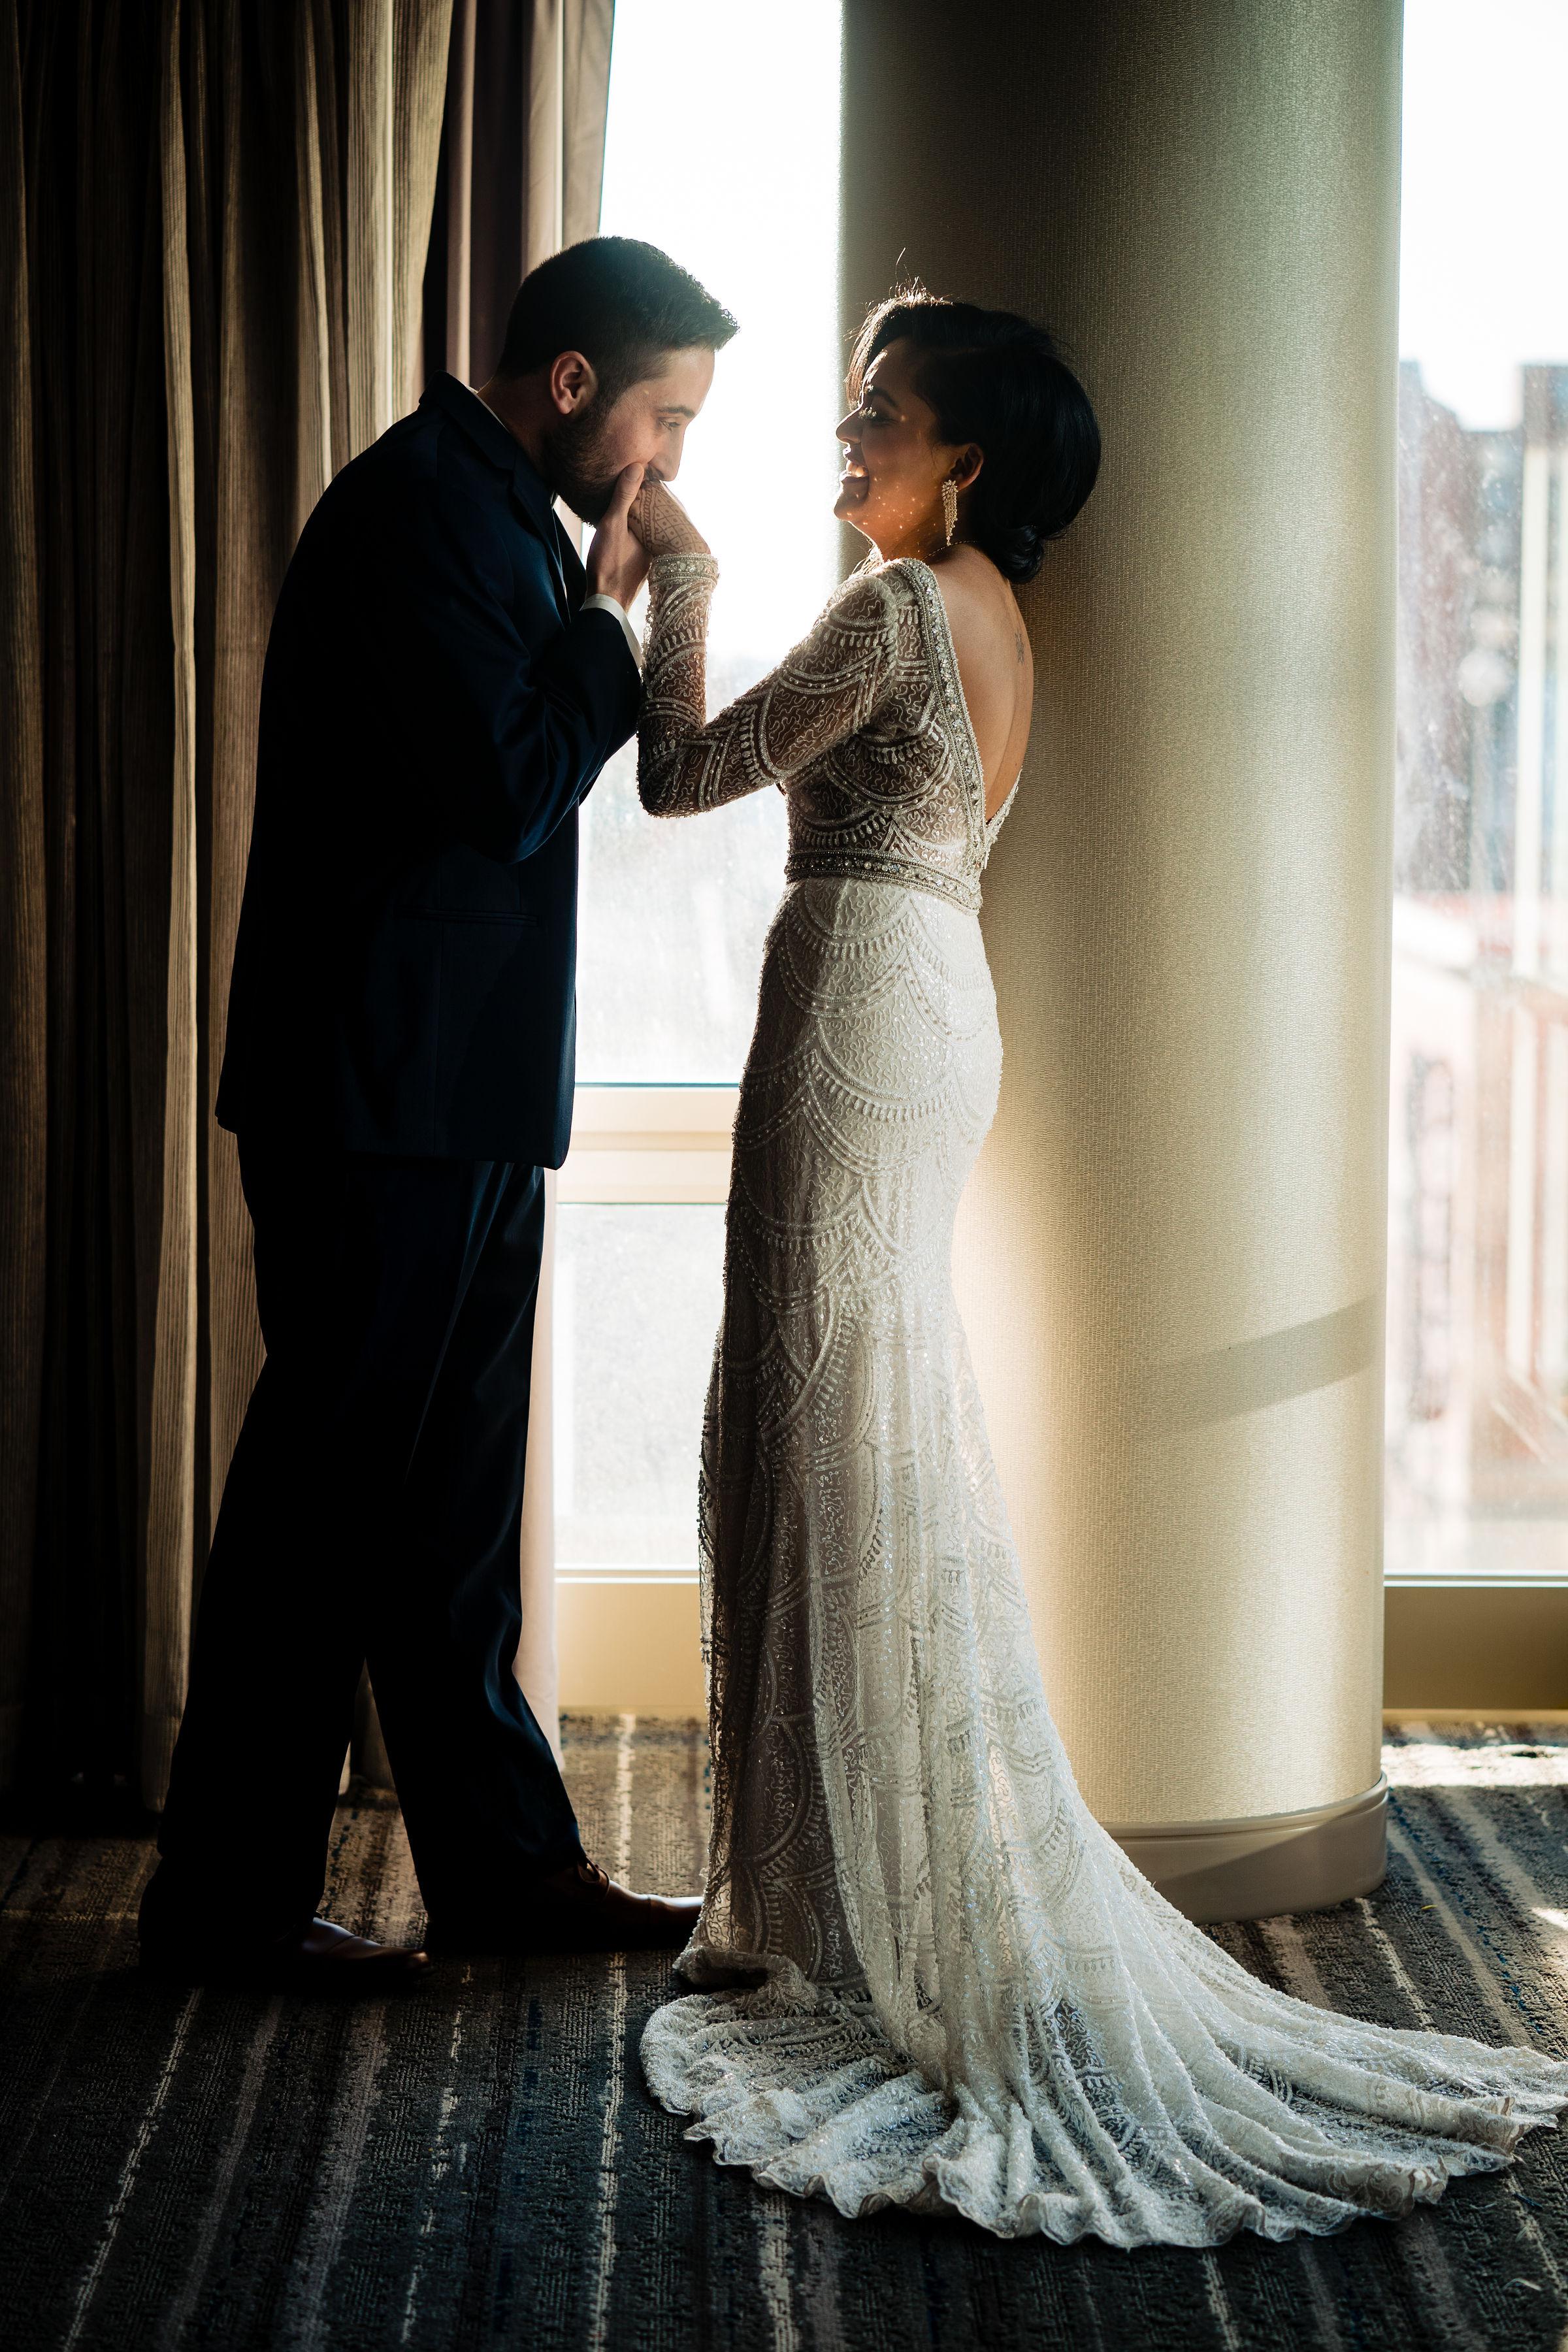 INDIAN WEDDING RECEPTION BRIDE AND GROOM.JPG